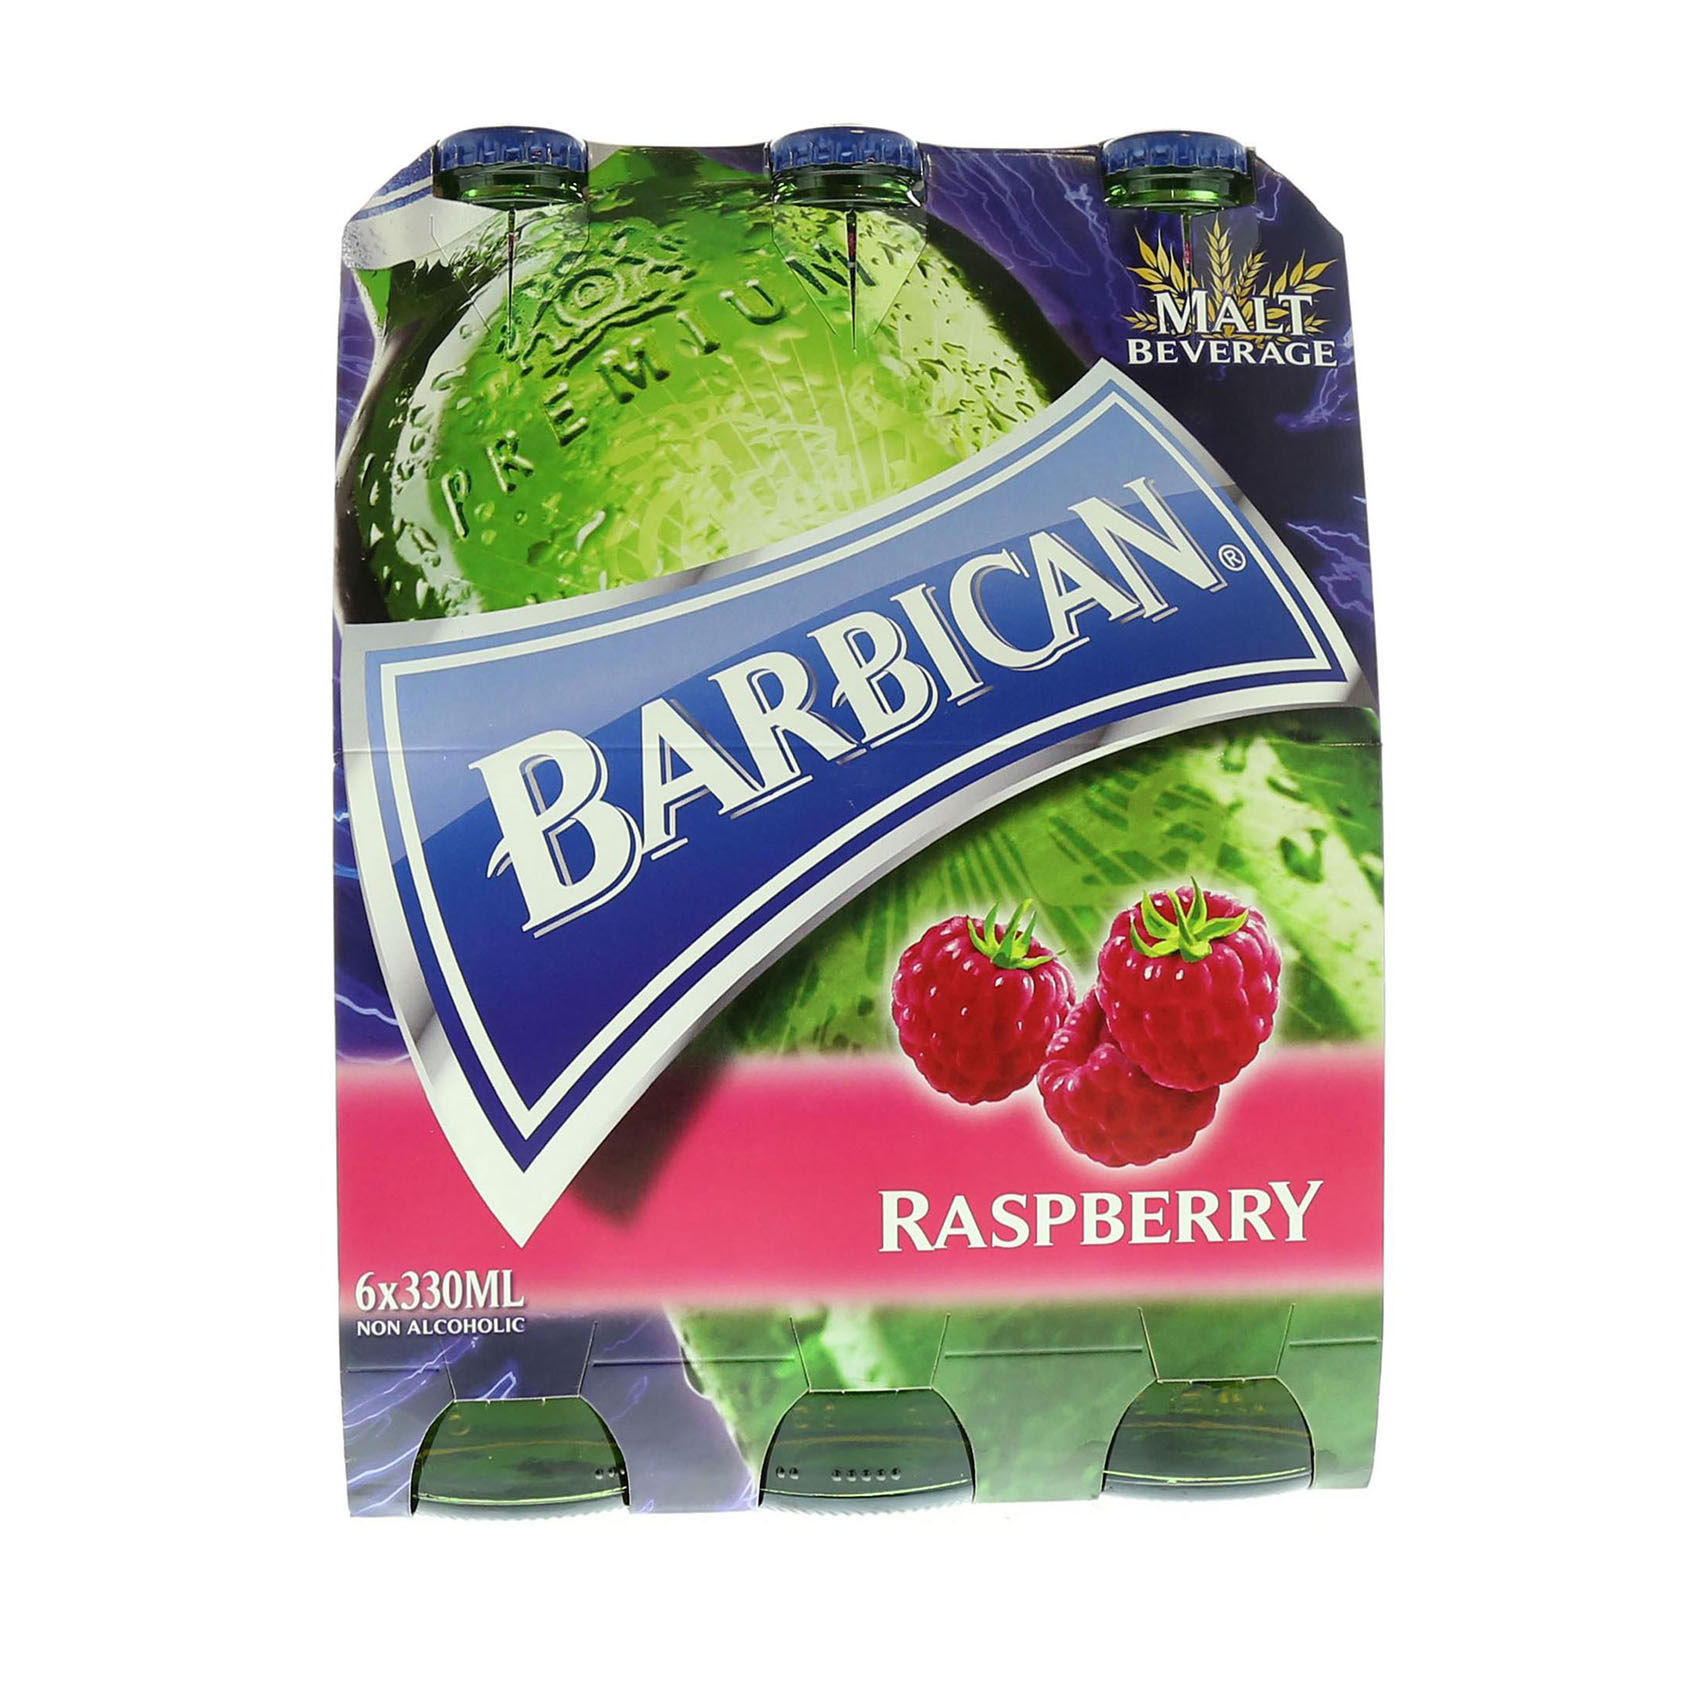 BARBICAN N/ALCO BEER R/BERRY330MLX6